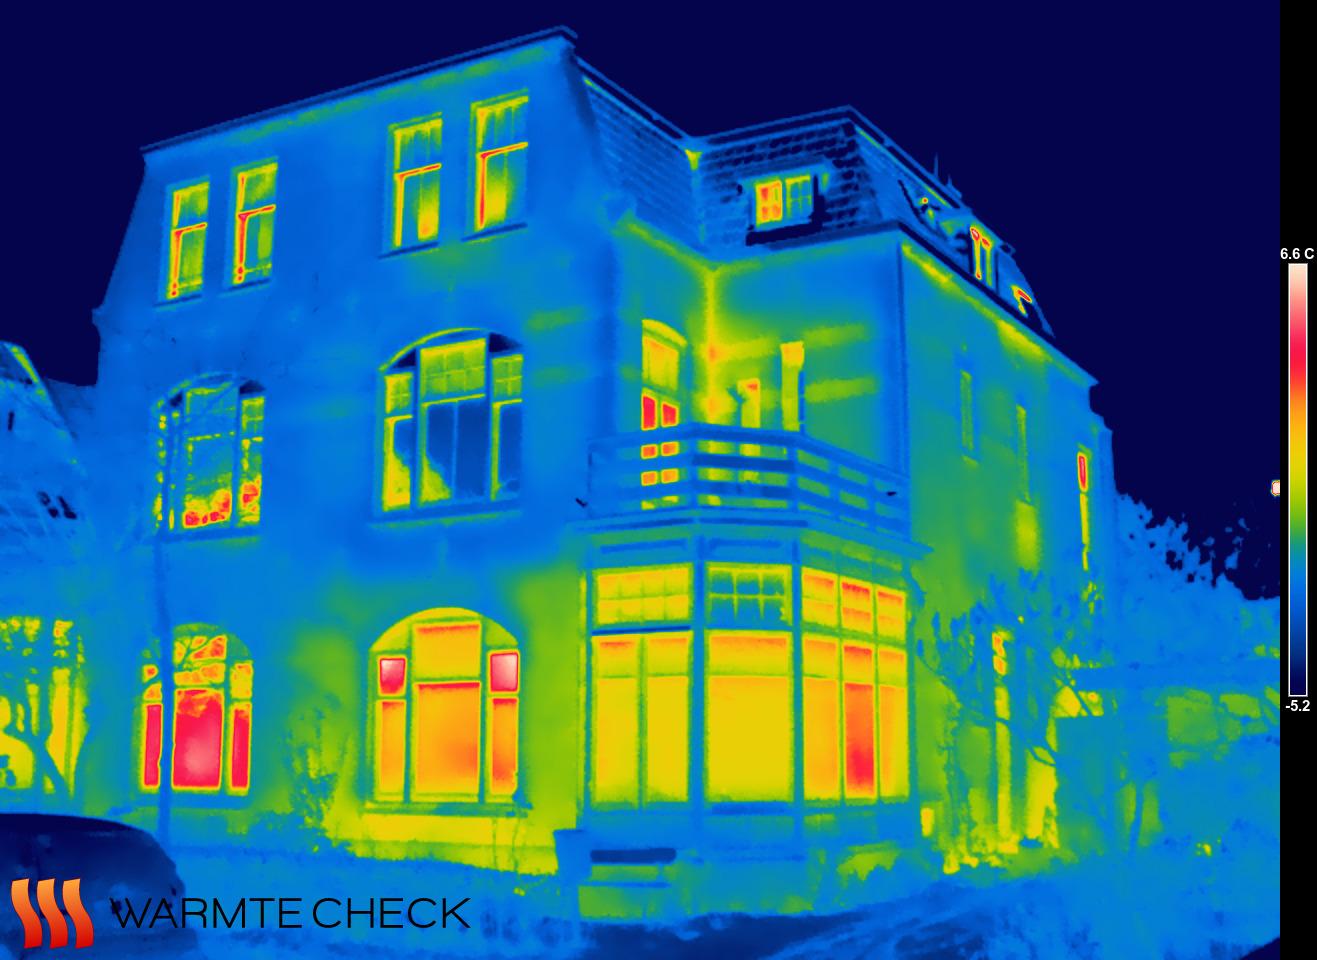 Alet's huis in infrarood beeld